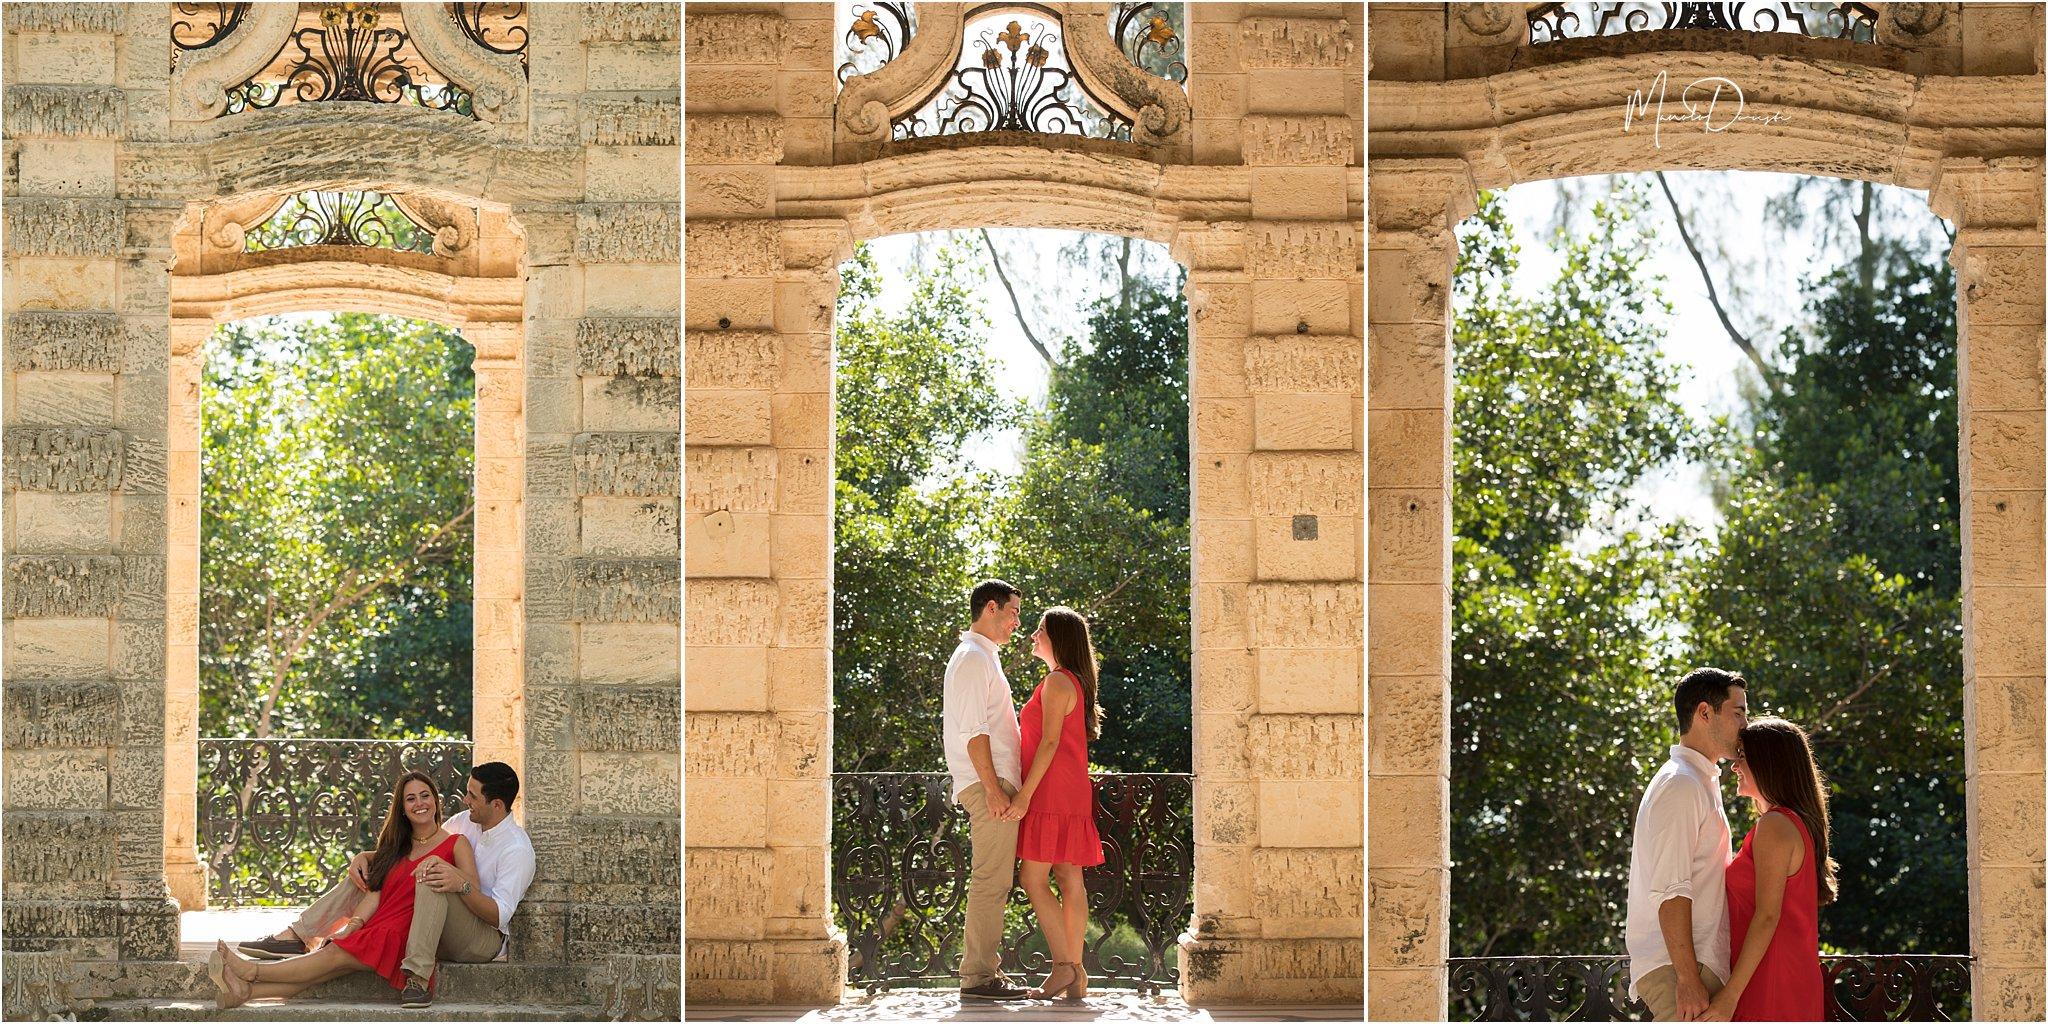 00862_ManoloDoreste_InFocusStudios_Wedding_Family_Photography_Miami_MiamiPhotographer.jpg